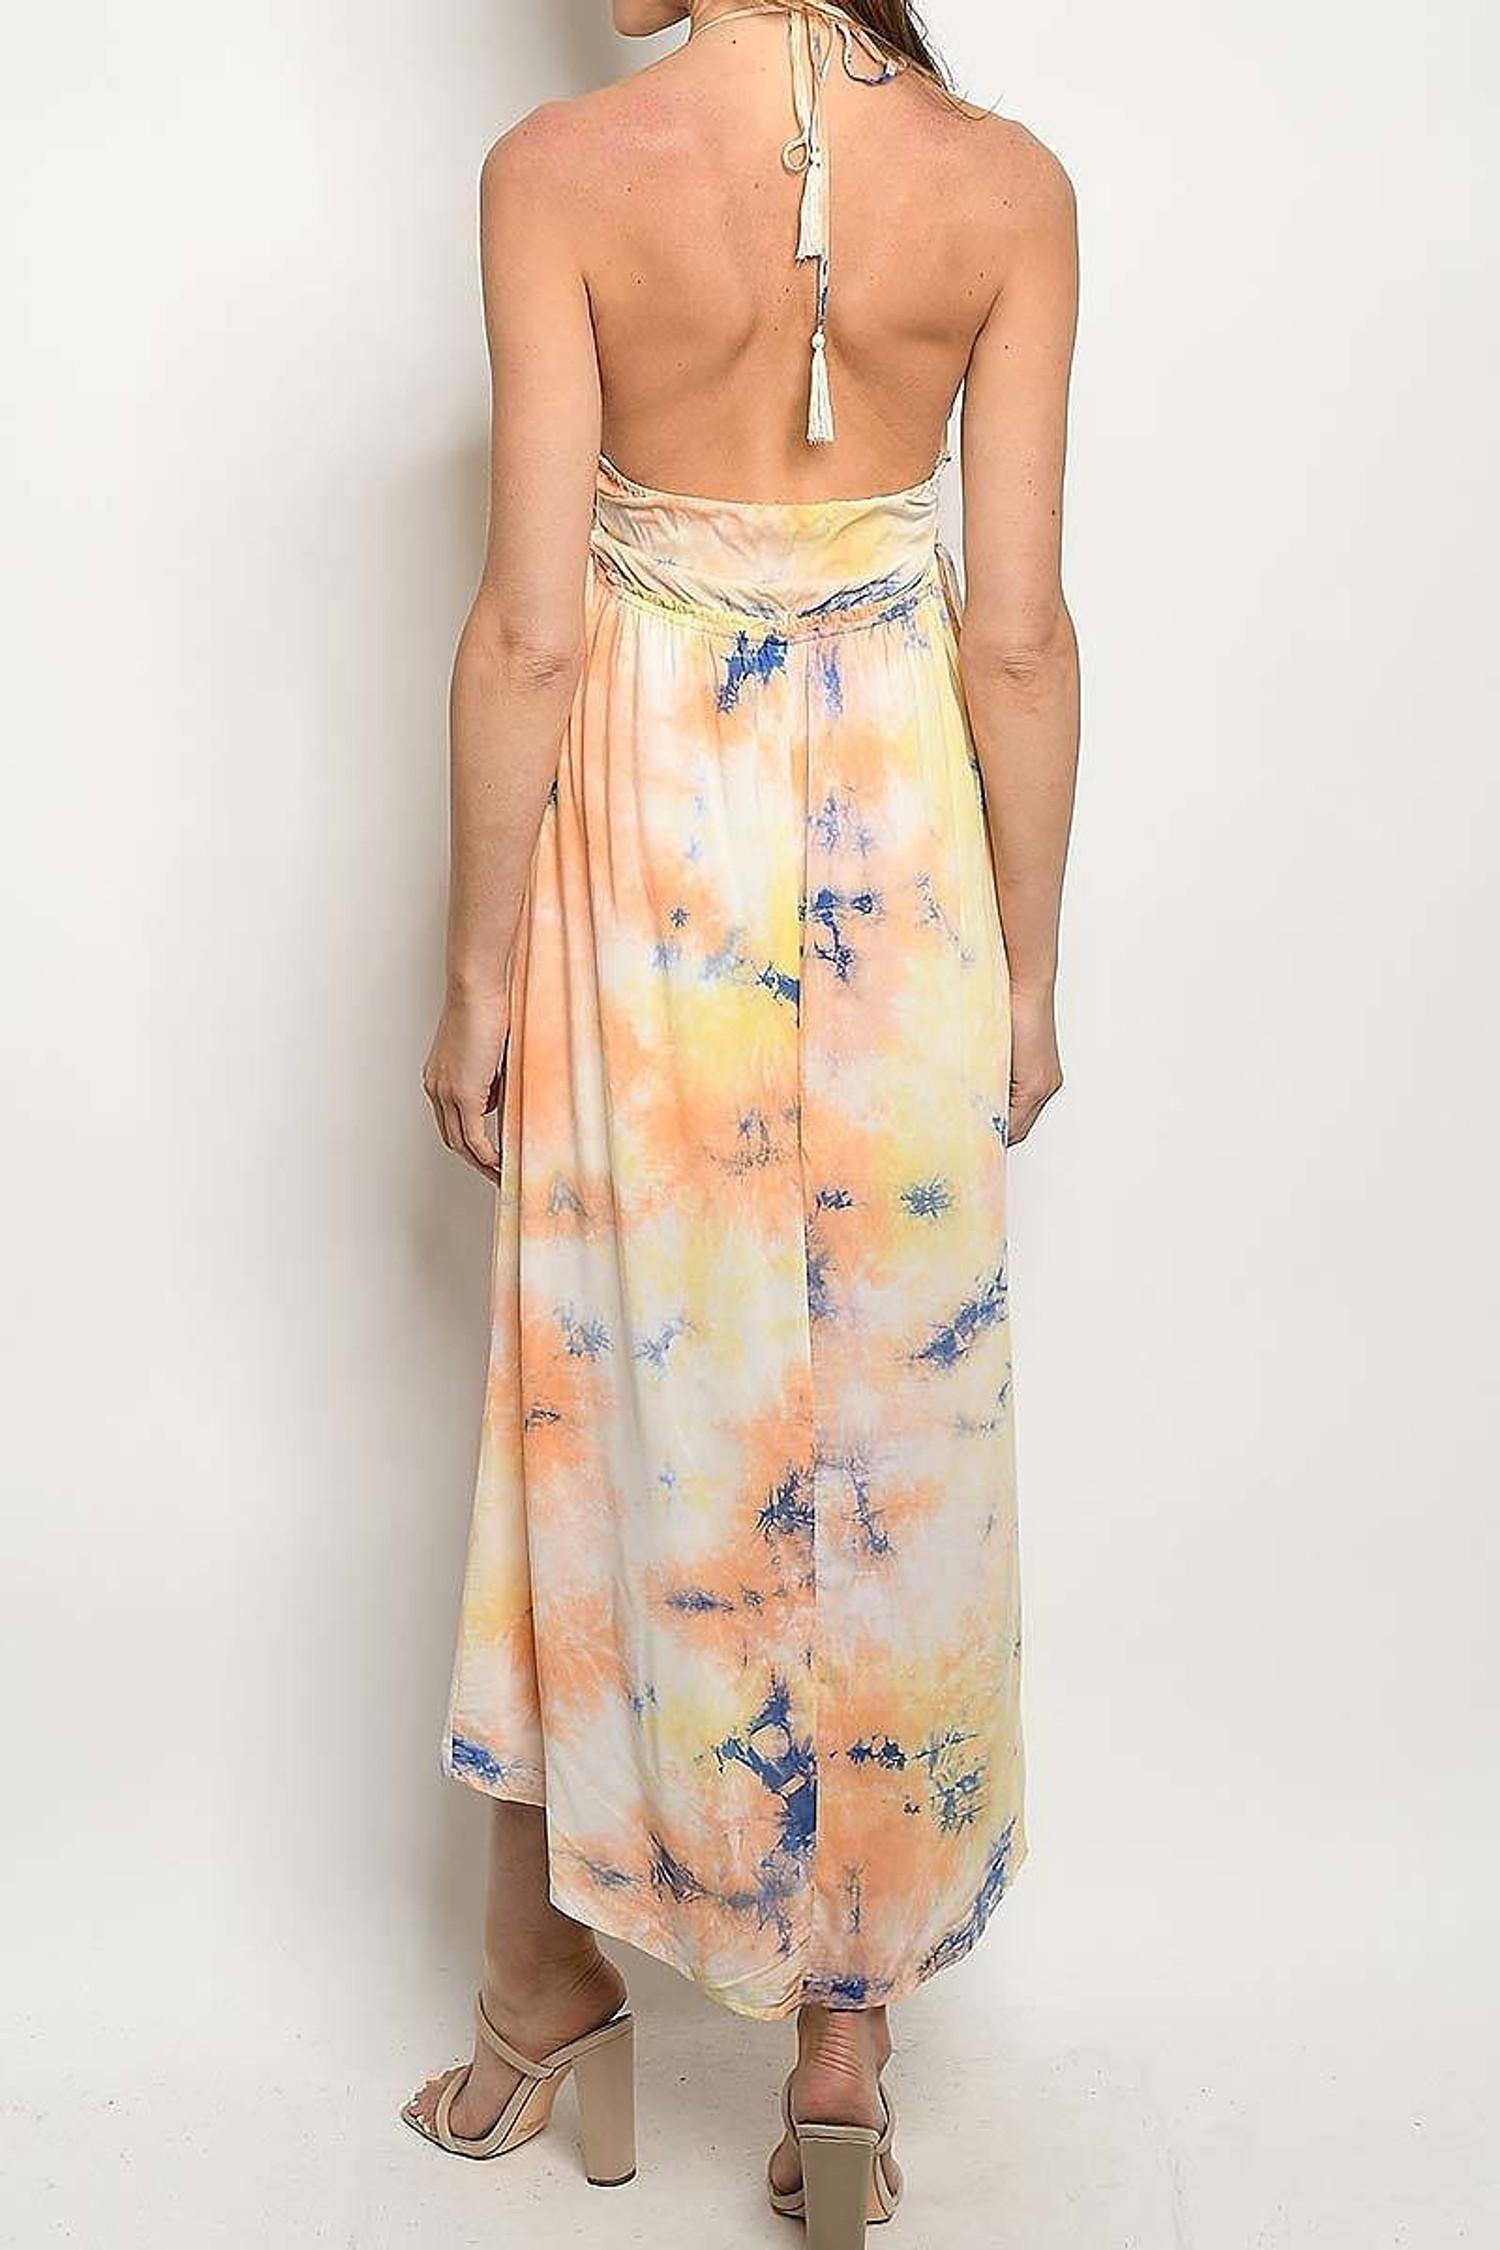 Slit Front Tie Dye Smocked Plunging Halter Neck Midi Dress